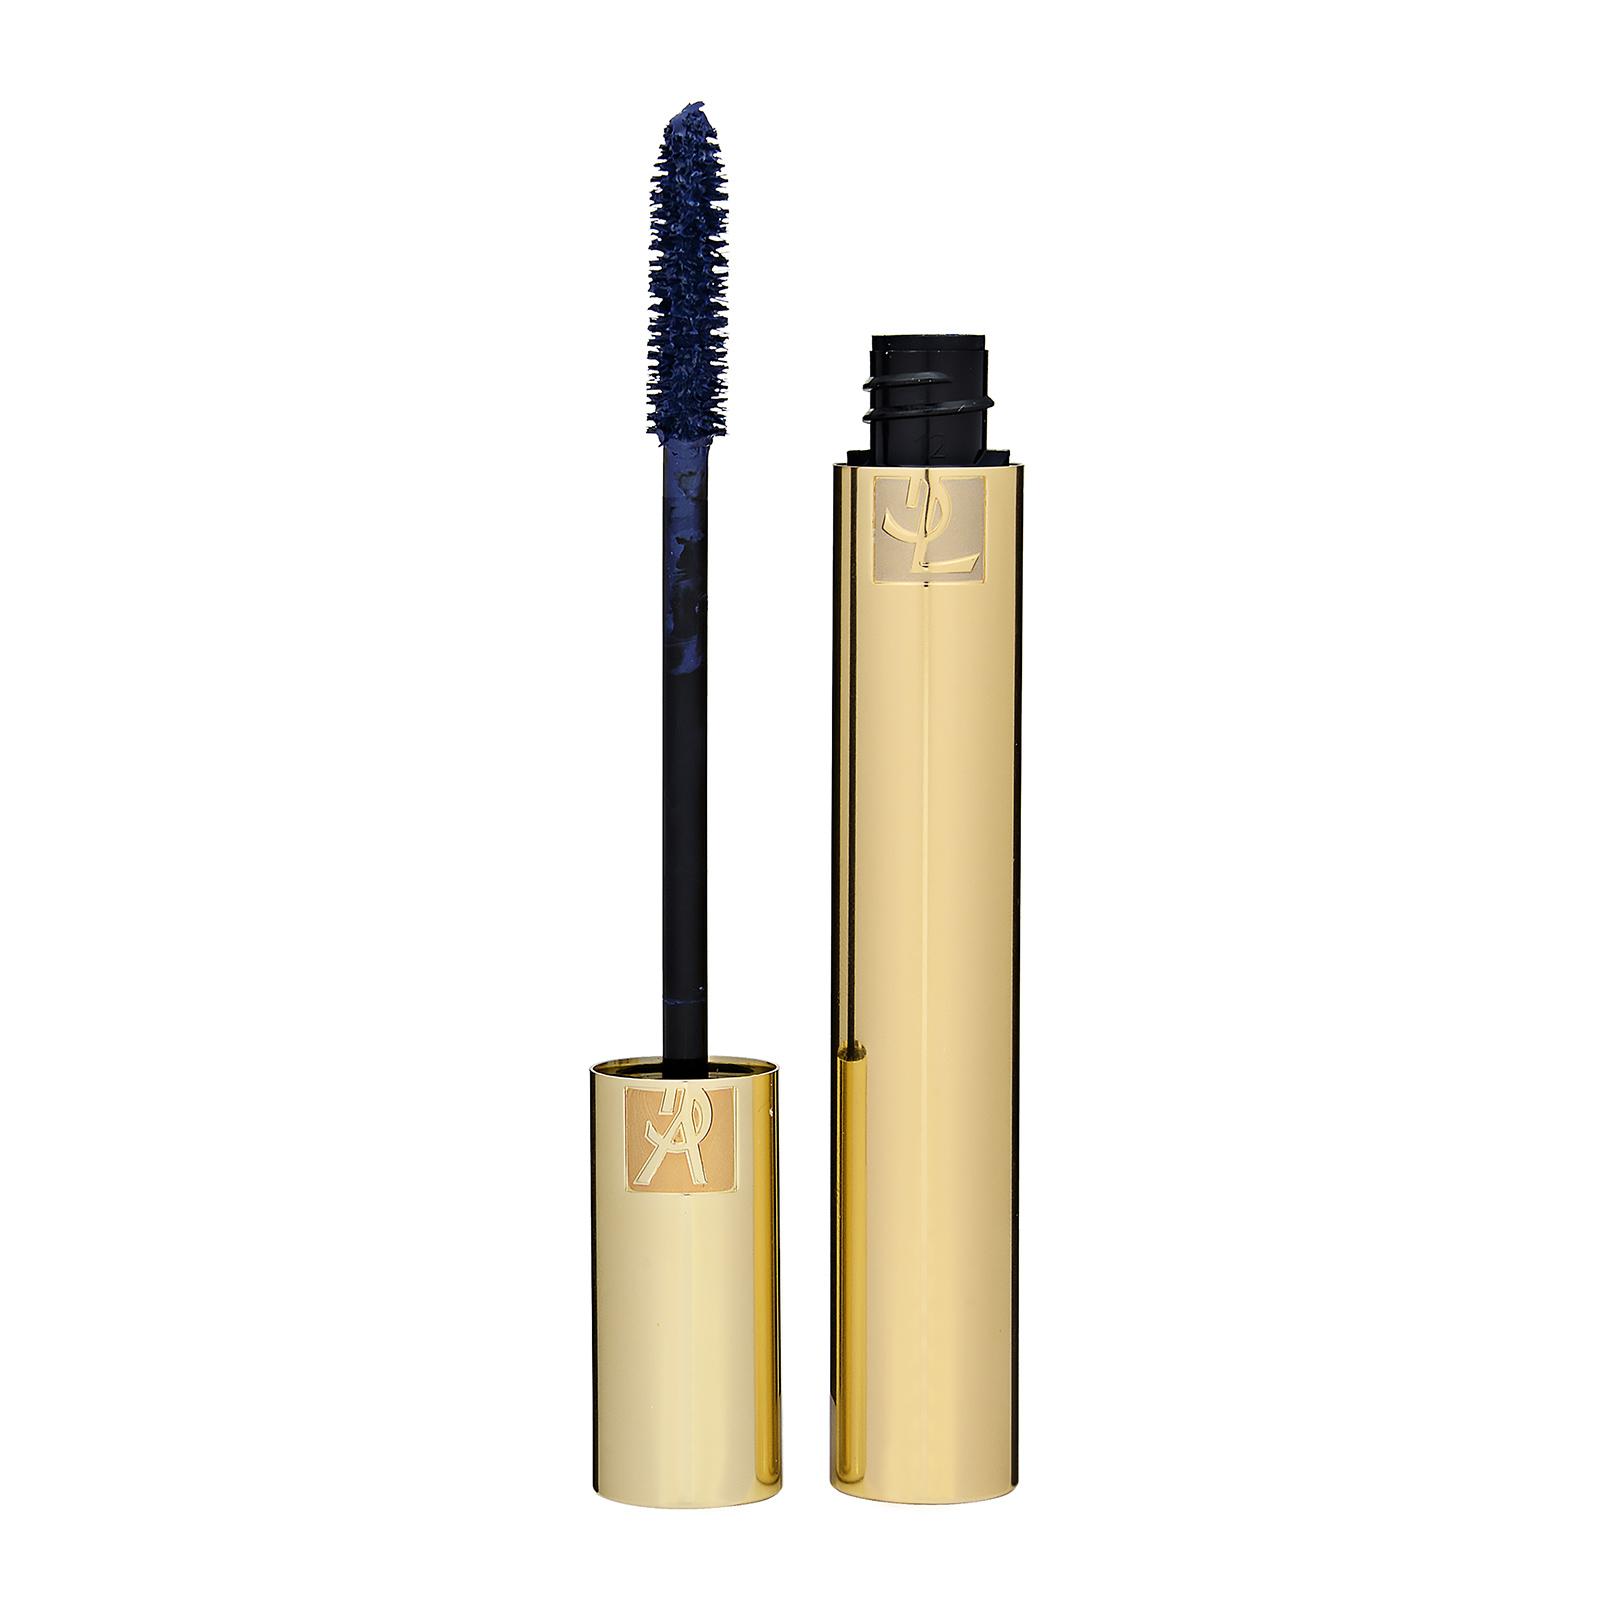 Yves Saint Laurent Mascara Volume Effet Faux Cils Luxurious Mascara For A False Lash Effect 6 Deep Night, 0.2oz, 7.5ml